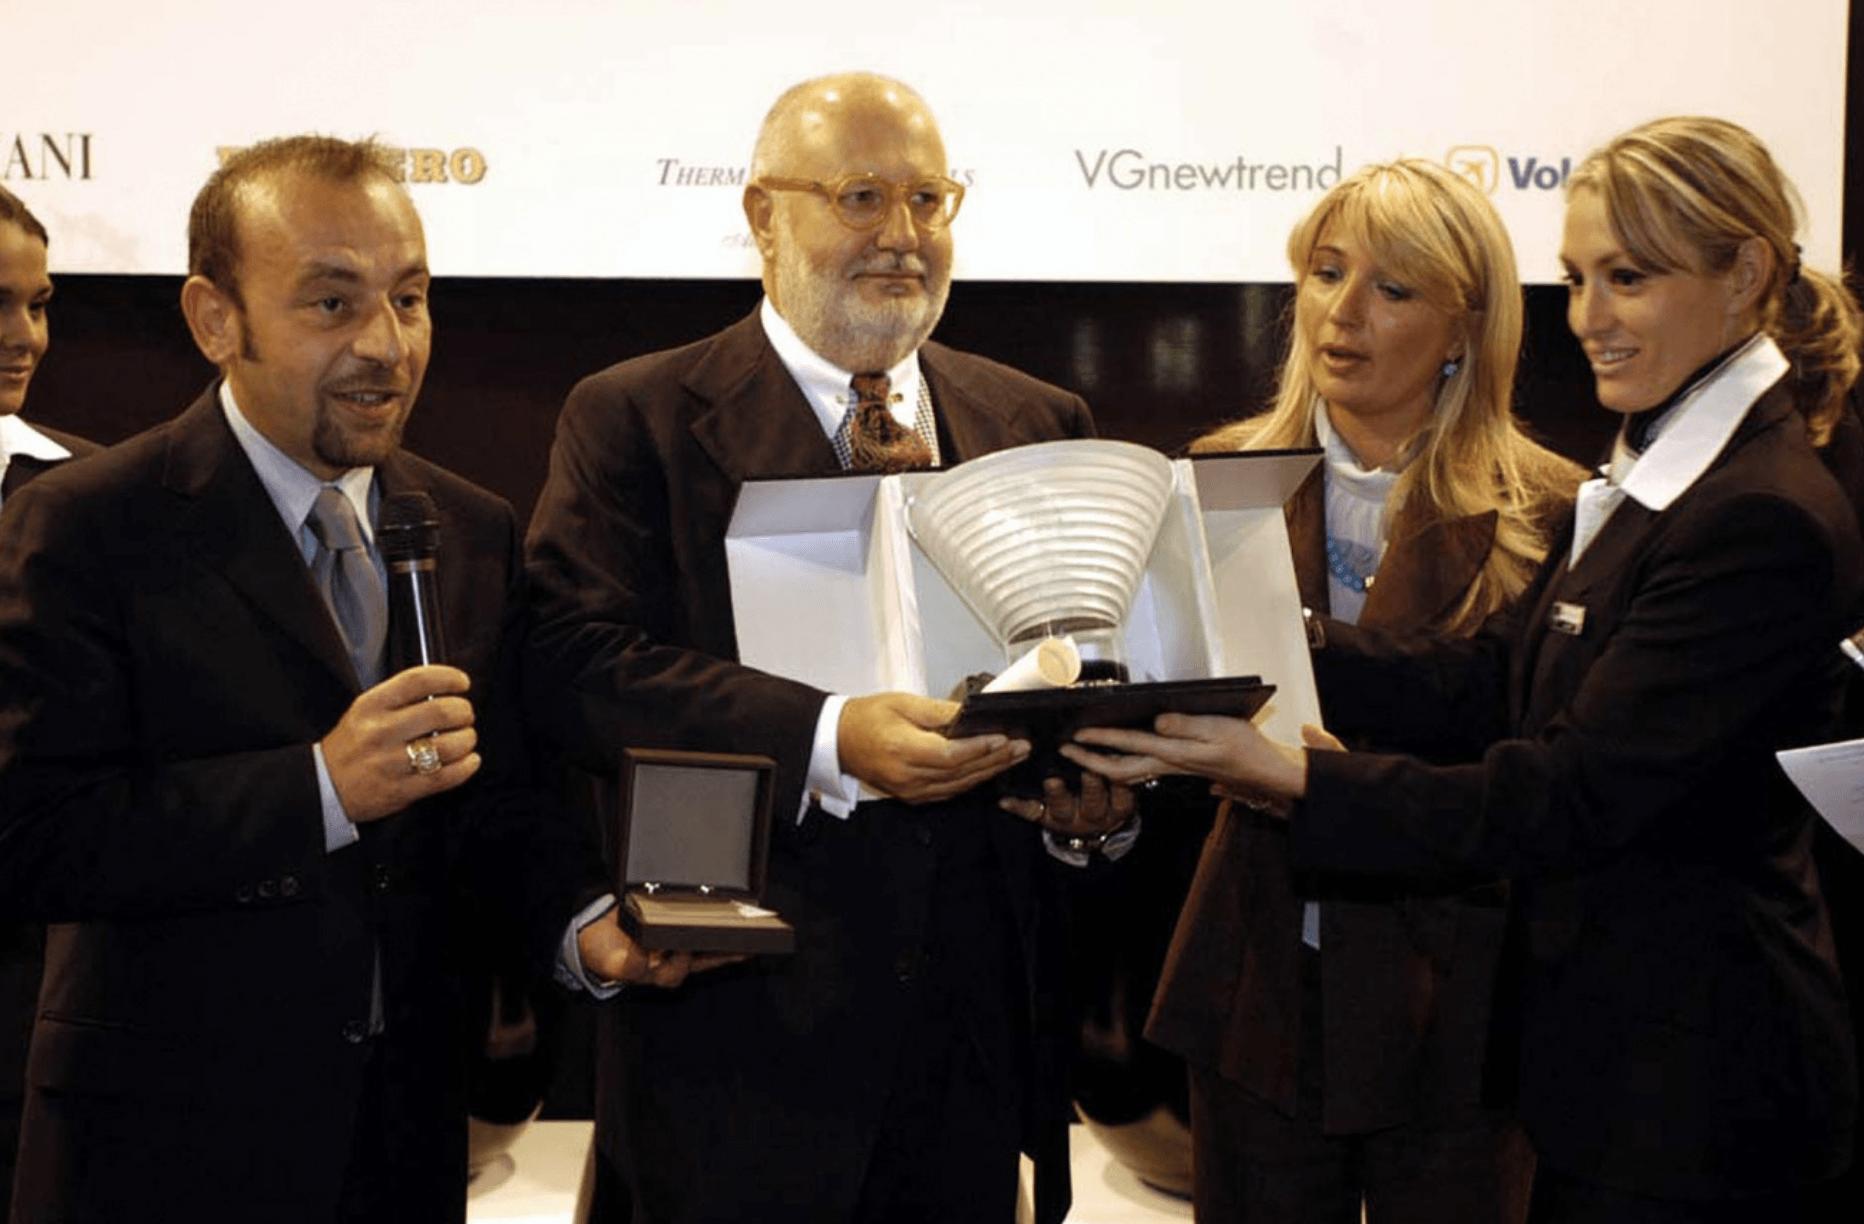 Gianfranco Ferre Receiving Awards 2004